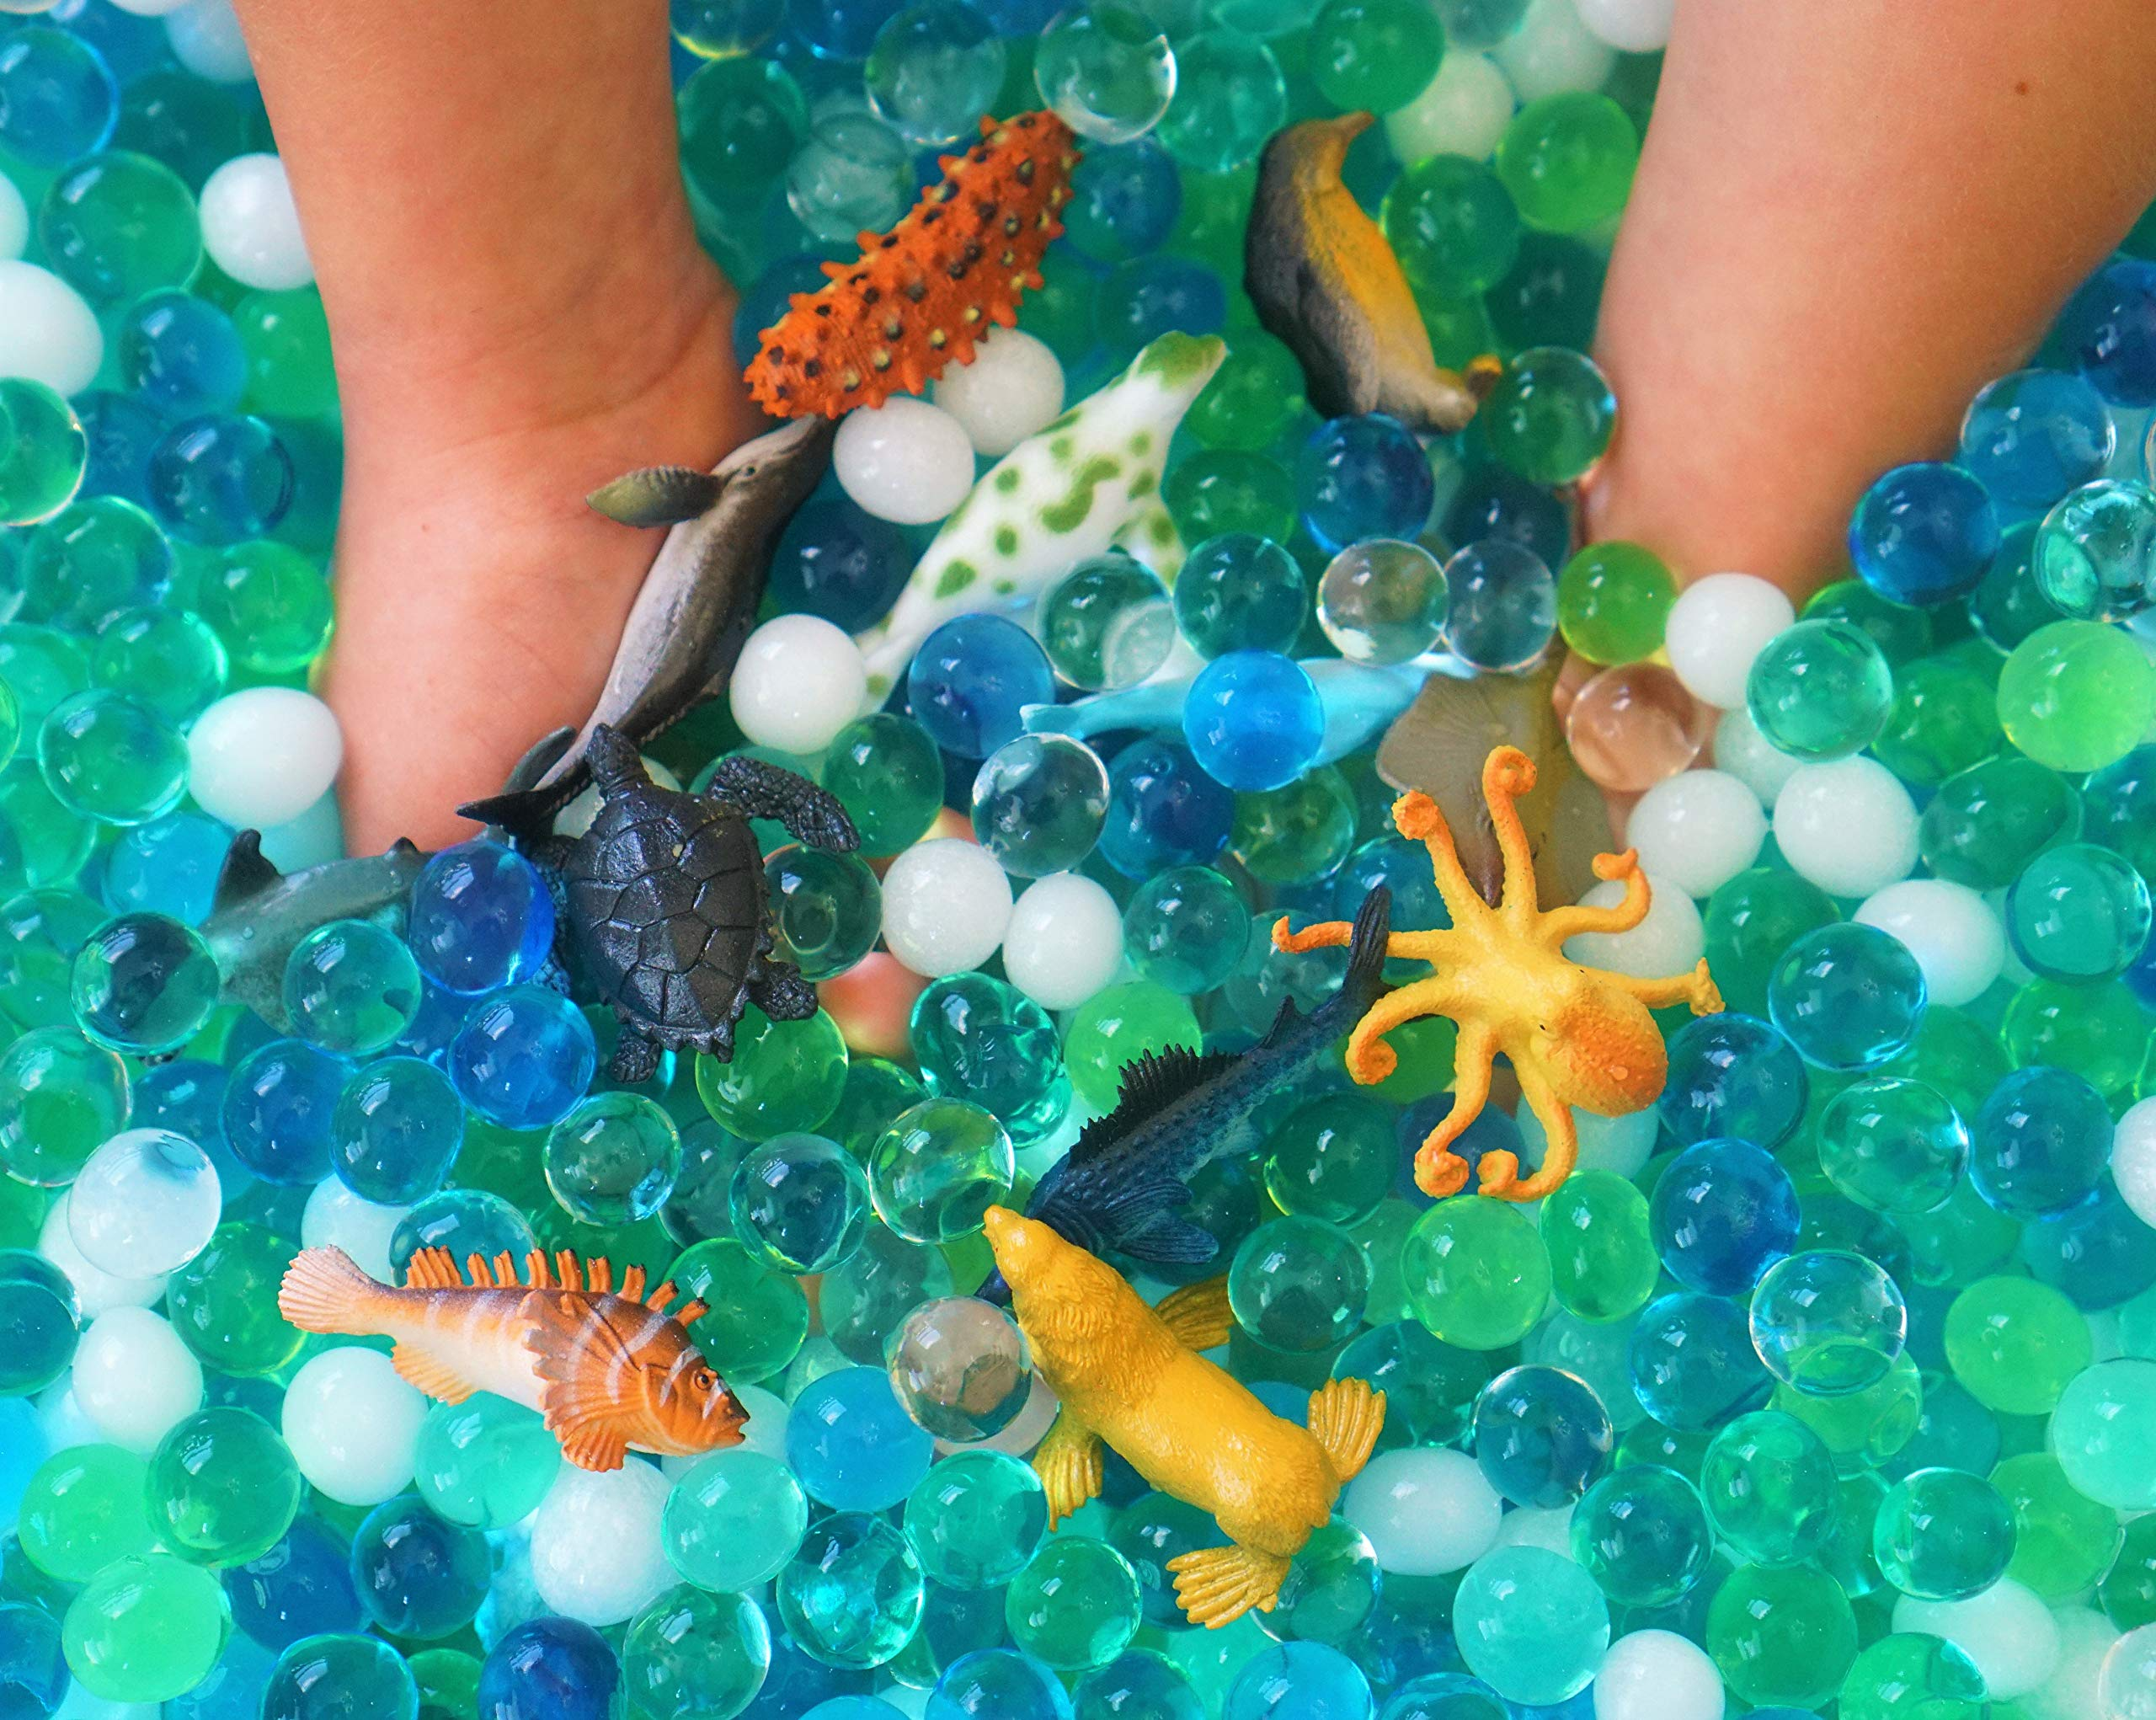 SENSORY4U Dew Drops Water Beads Ocean Explorers Tactile Sensory Kit - Sea Animal Creatures Included - Great Fine Motor Skills Toy for Kids